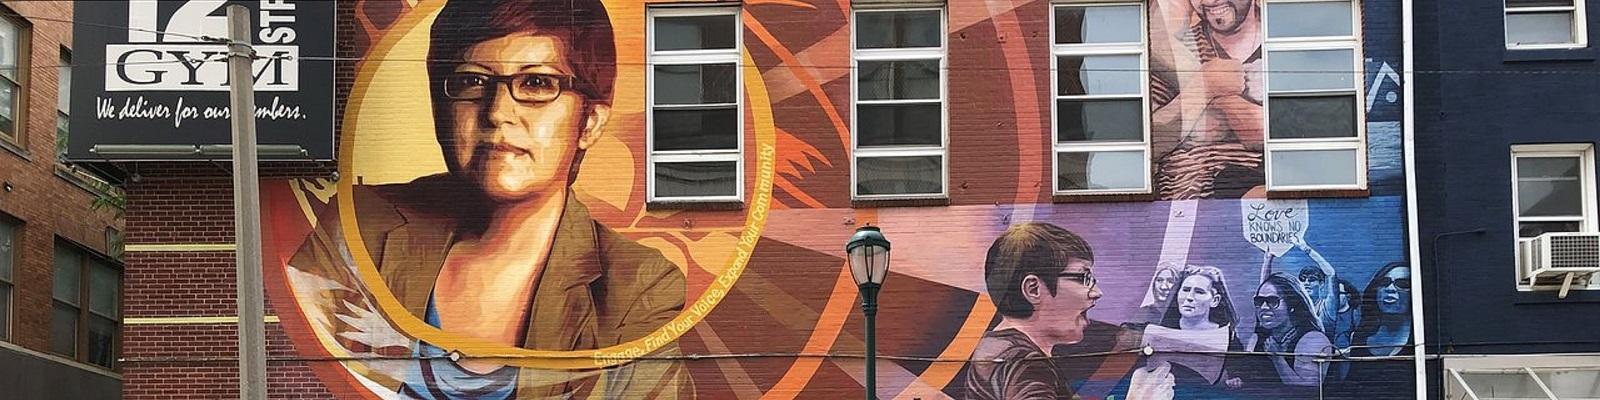 Gloria Casarez mural in Philly's Gayborhood